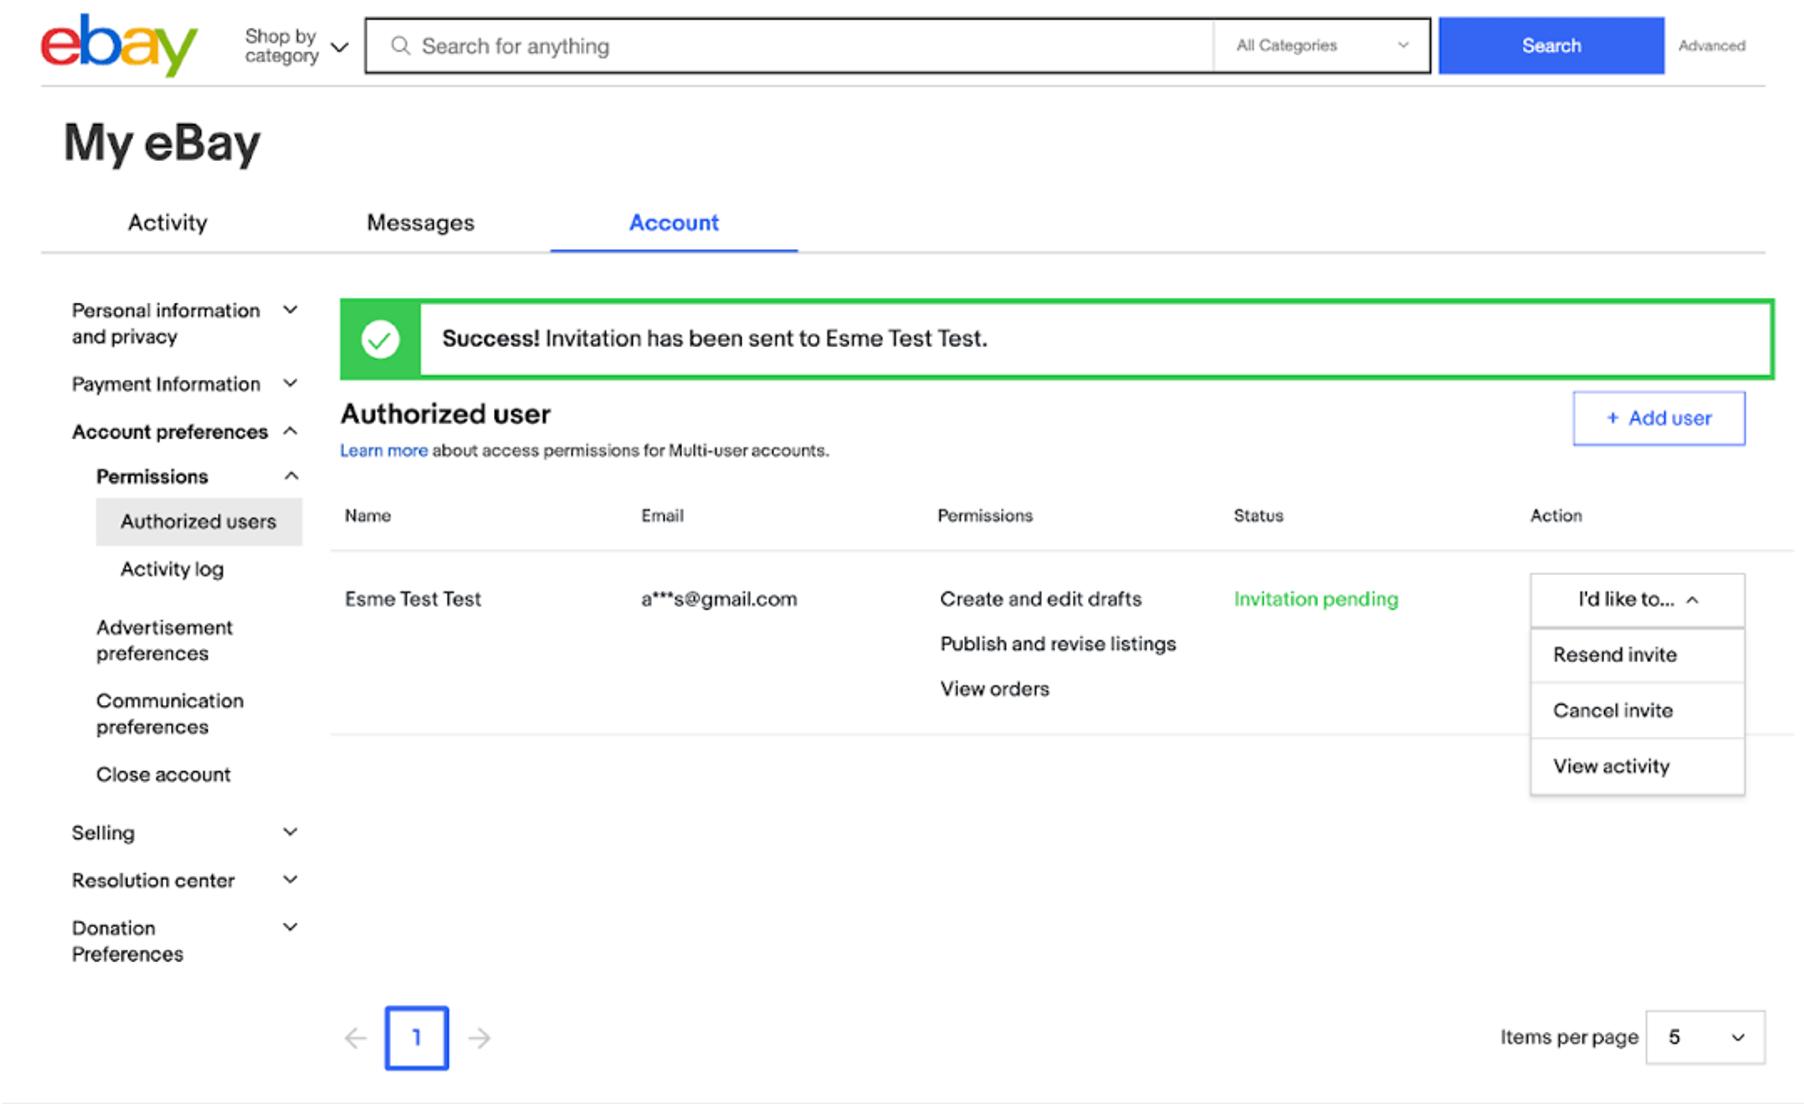 Access Permissions for Multi-user accounts